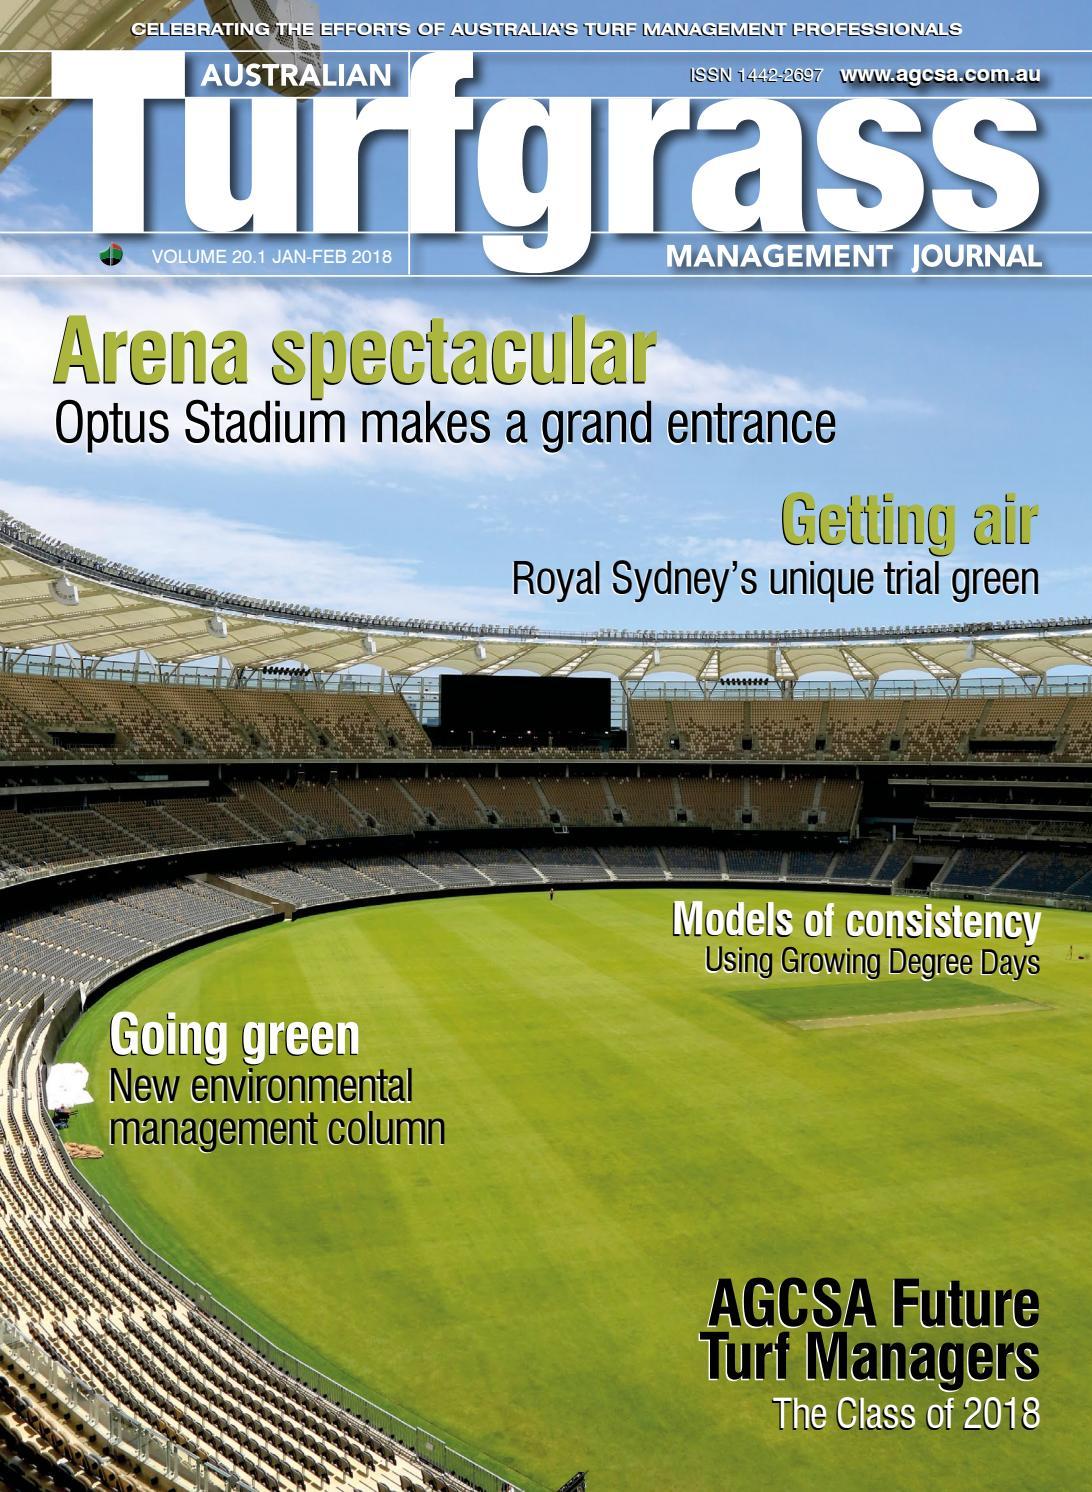 Australian Turfgrass Management Journal - Volume 20 1